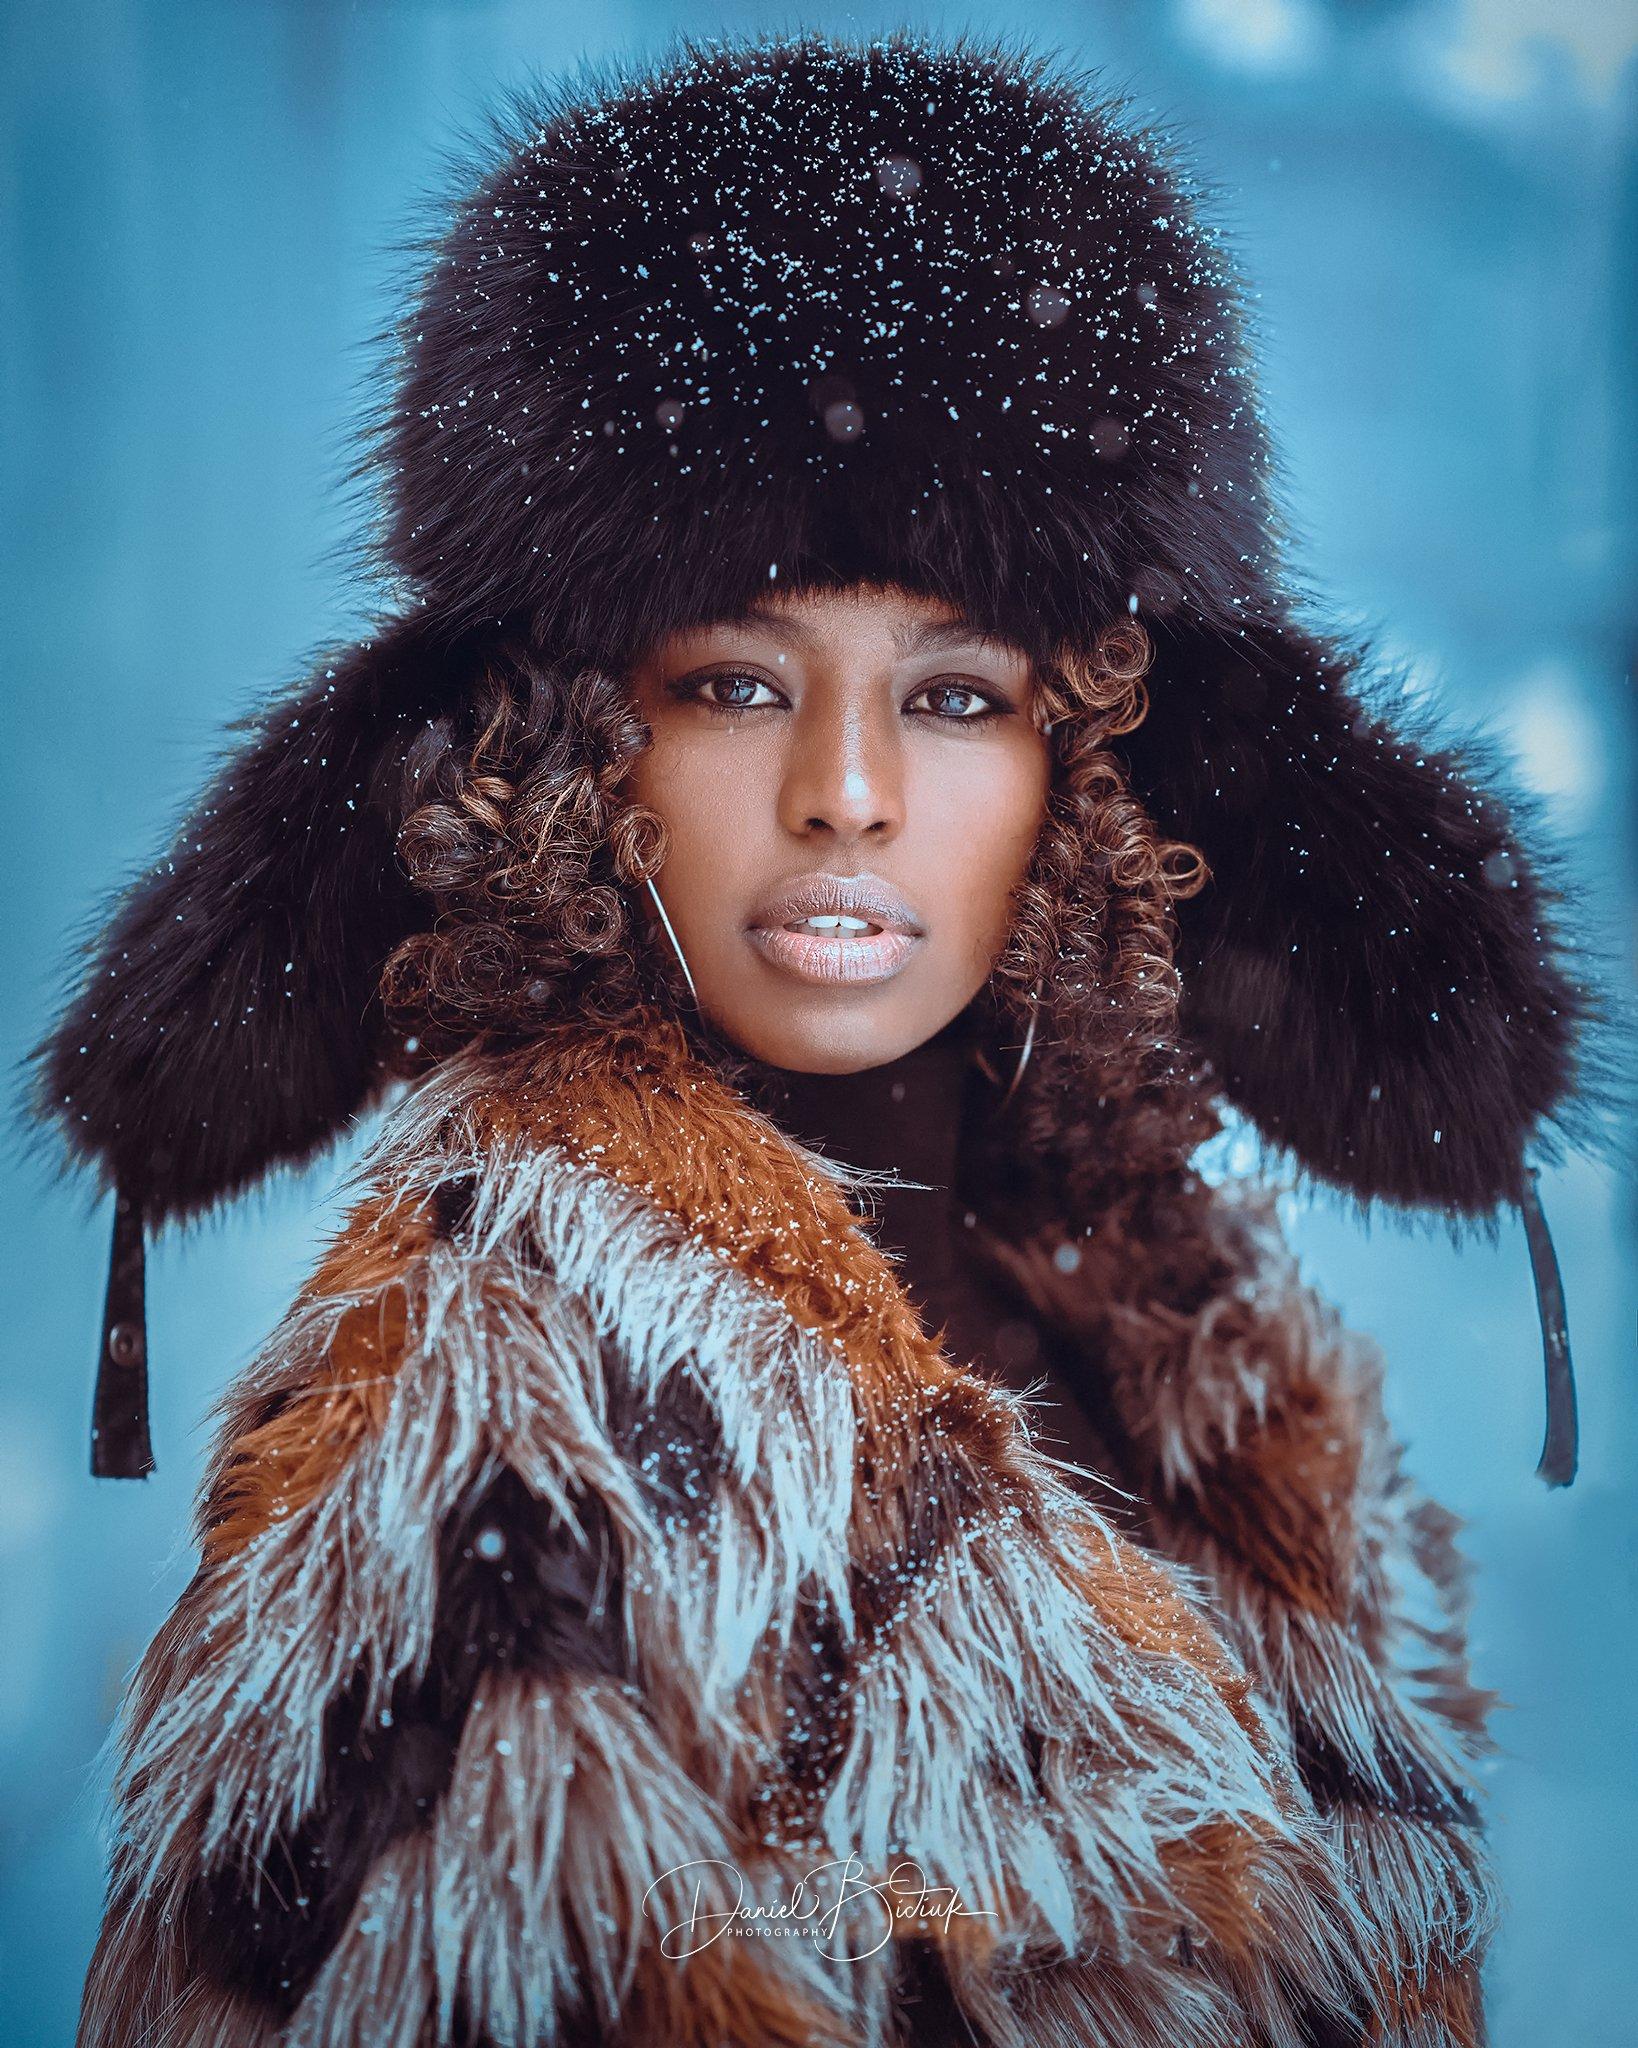 portrait uchatka fur hat girl , Daniel Bidiuk